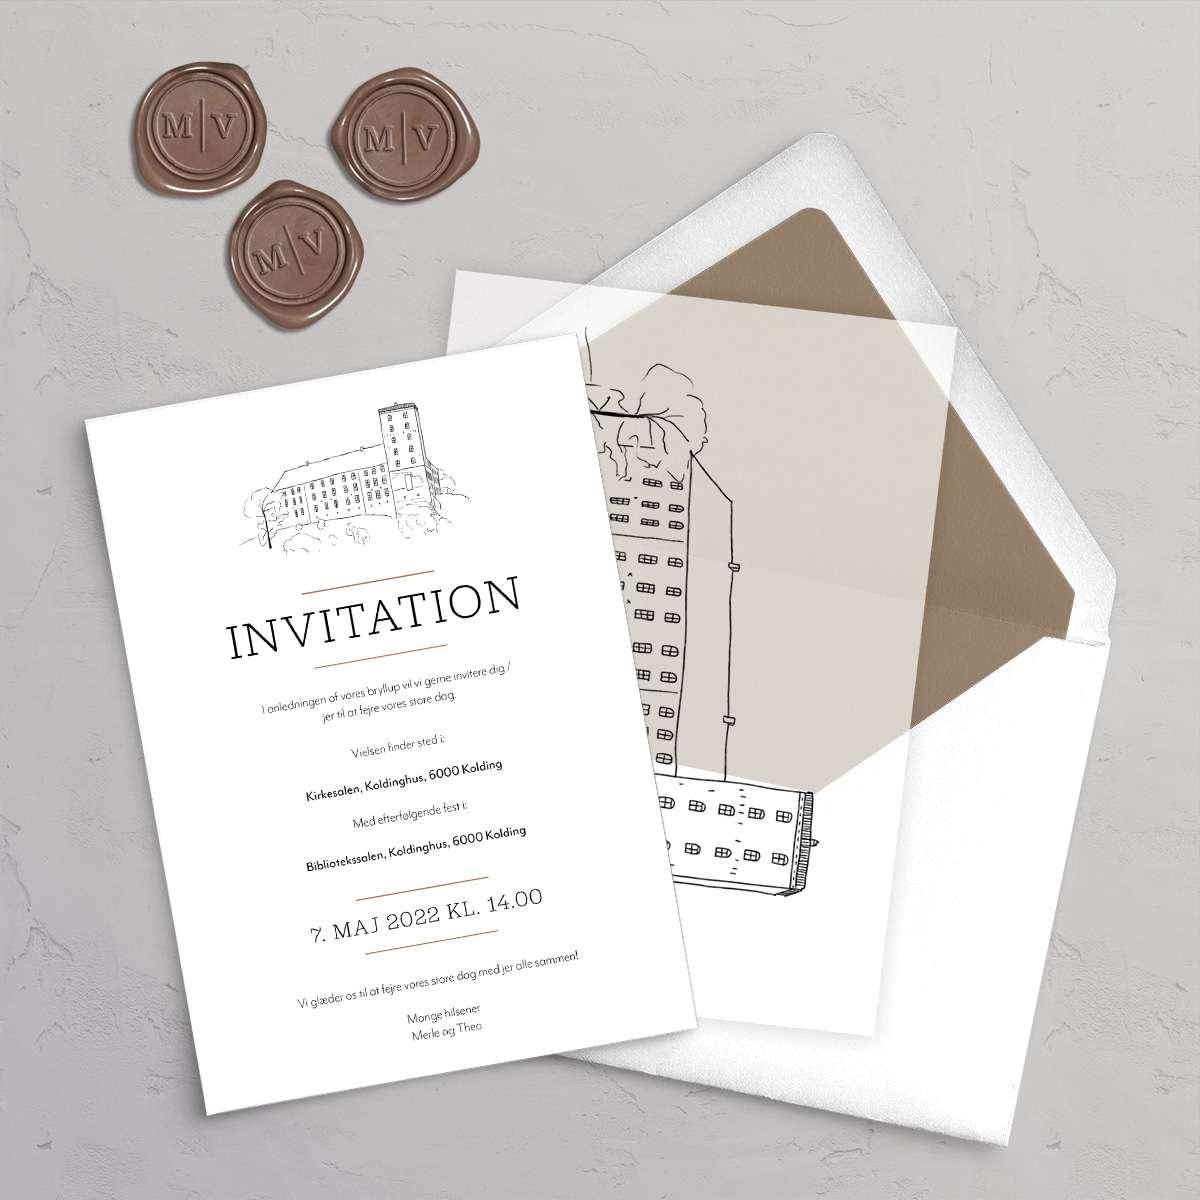 Bryllupsinvitation Koldinghus med vellumcover, monogram klistermærke og foret kuvert i farven Coffee